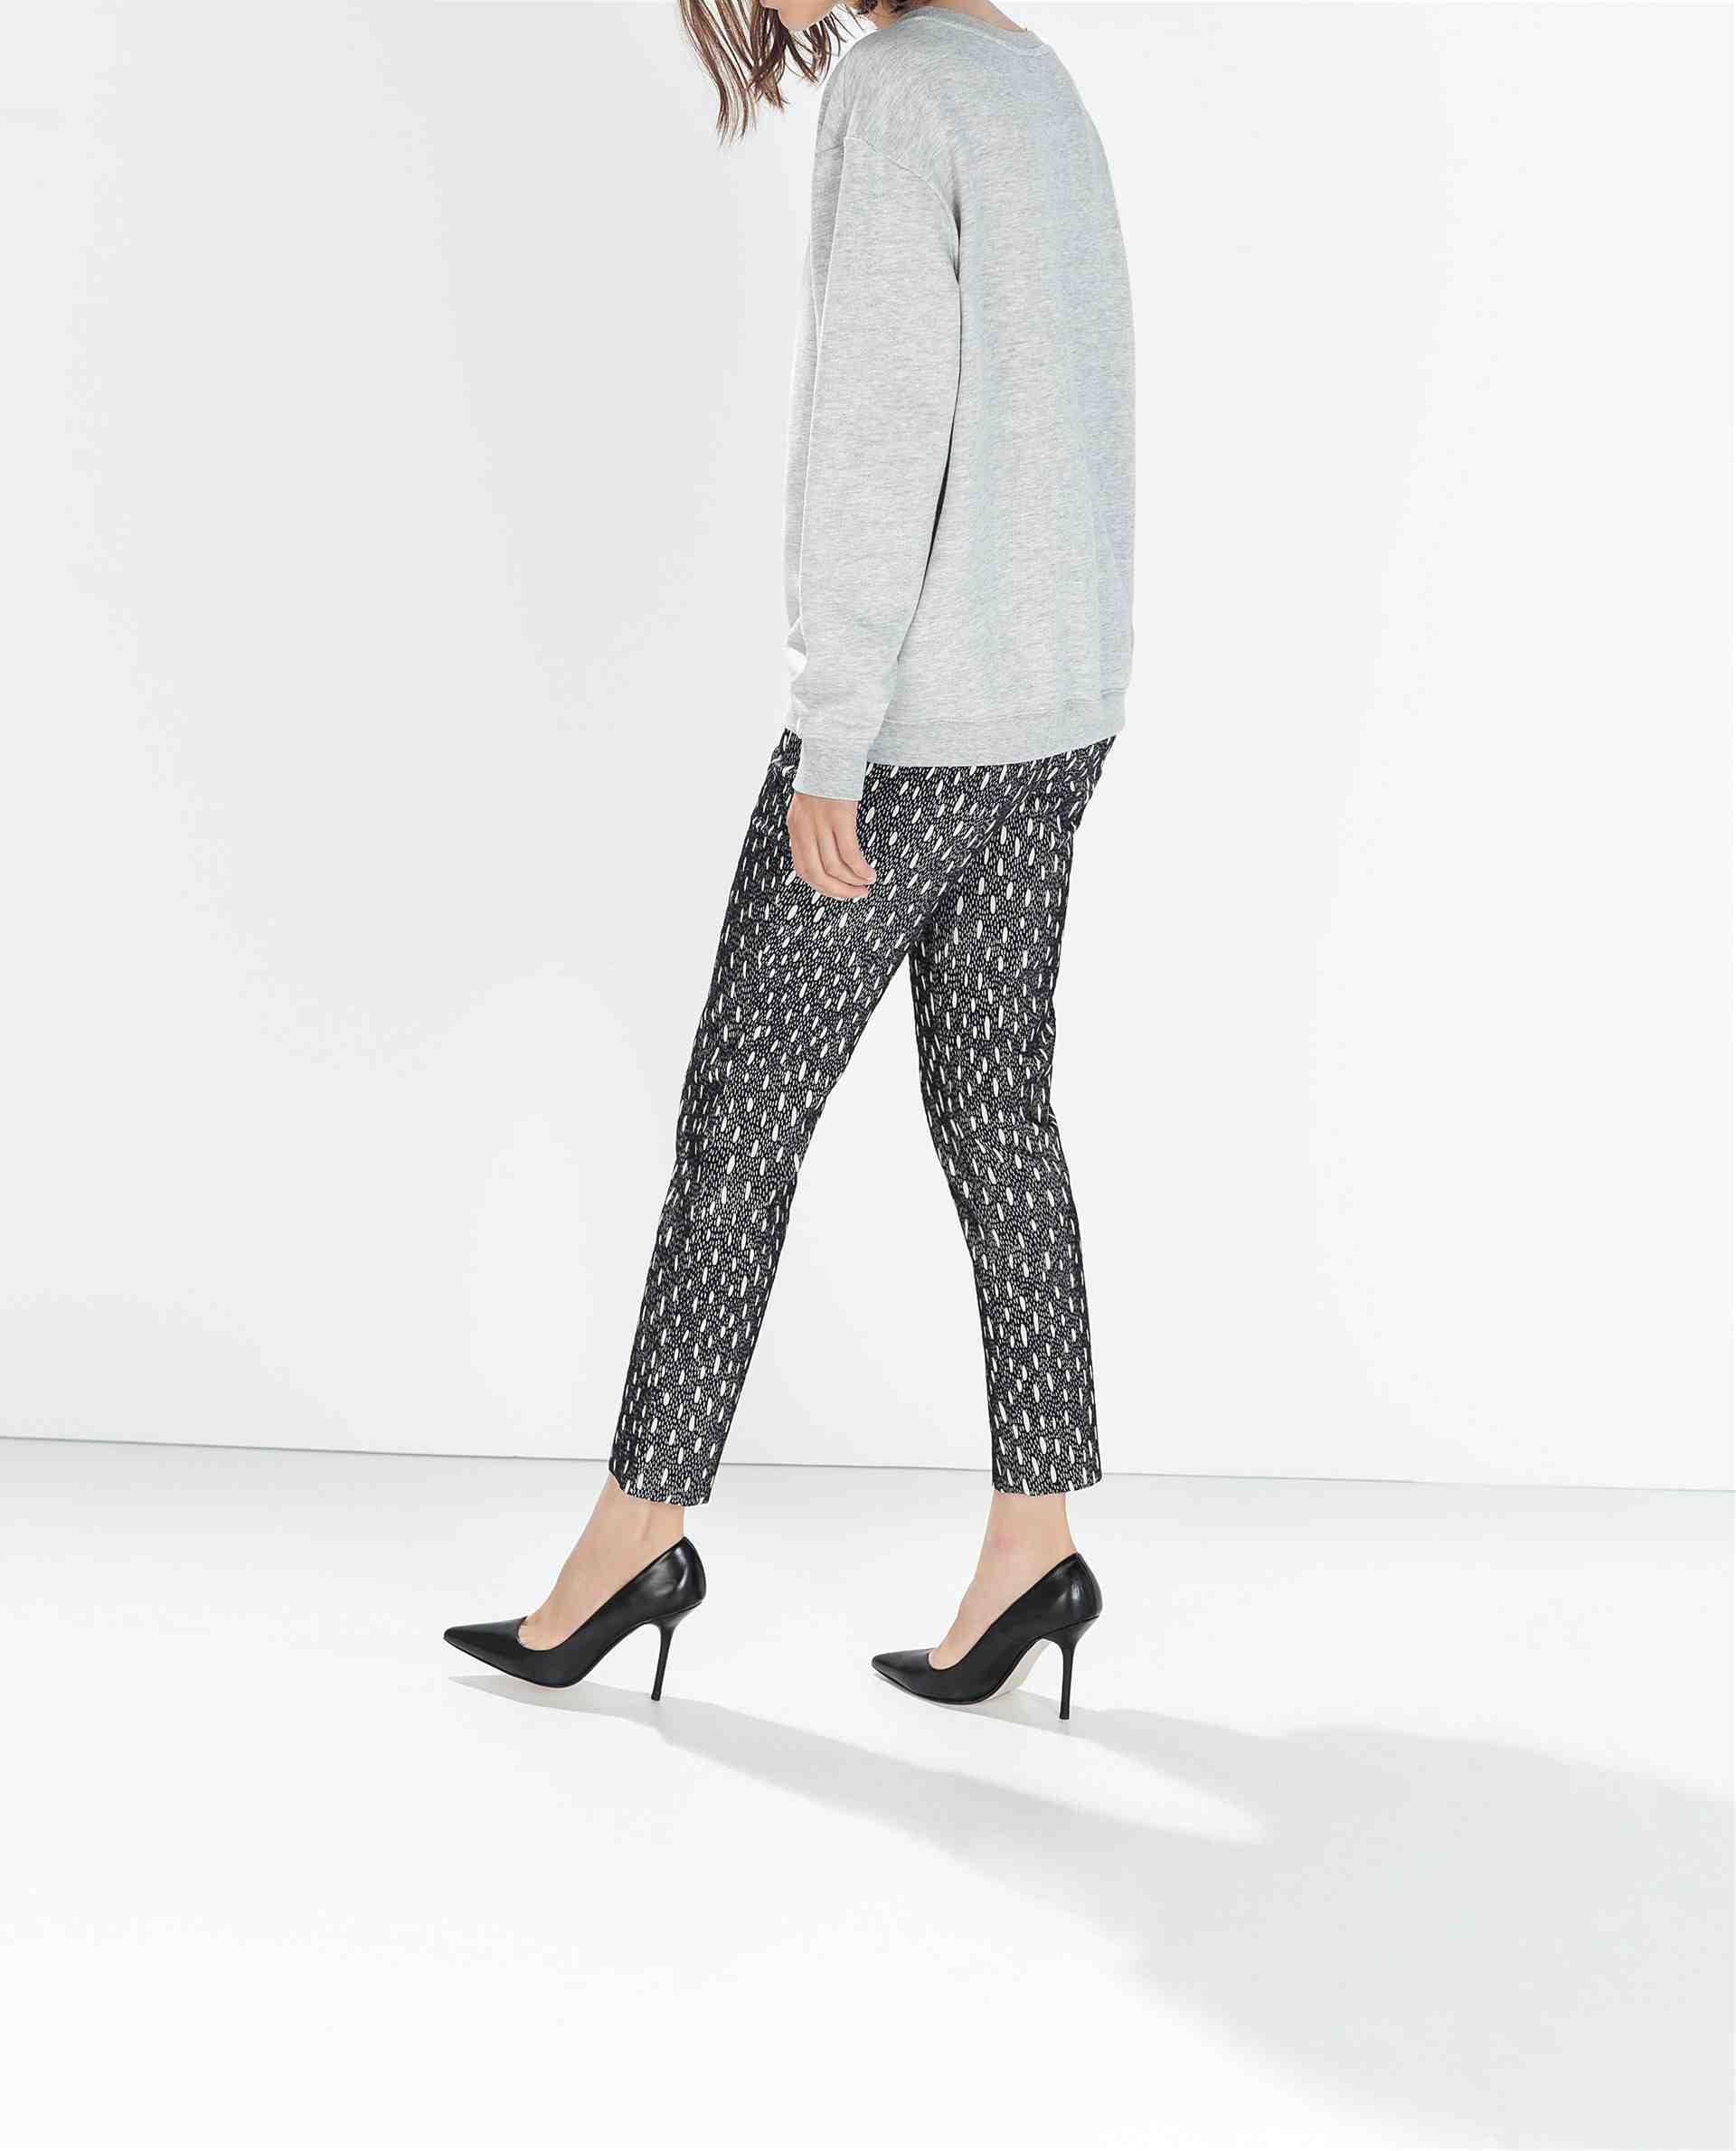 Zara - Pantalon(40 €)